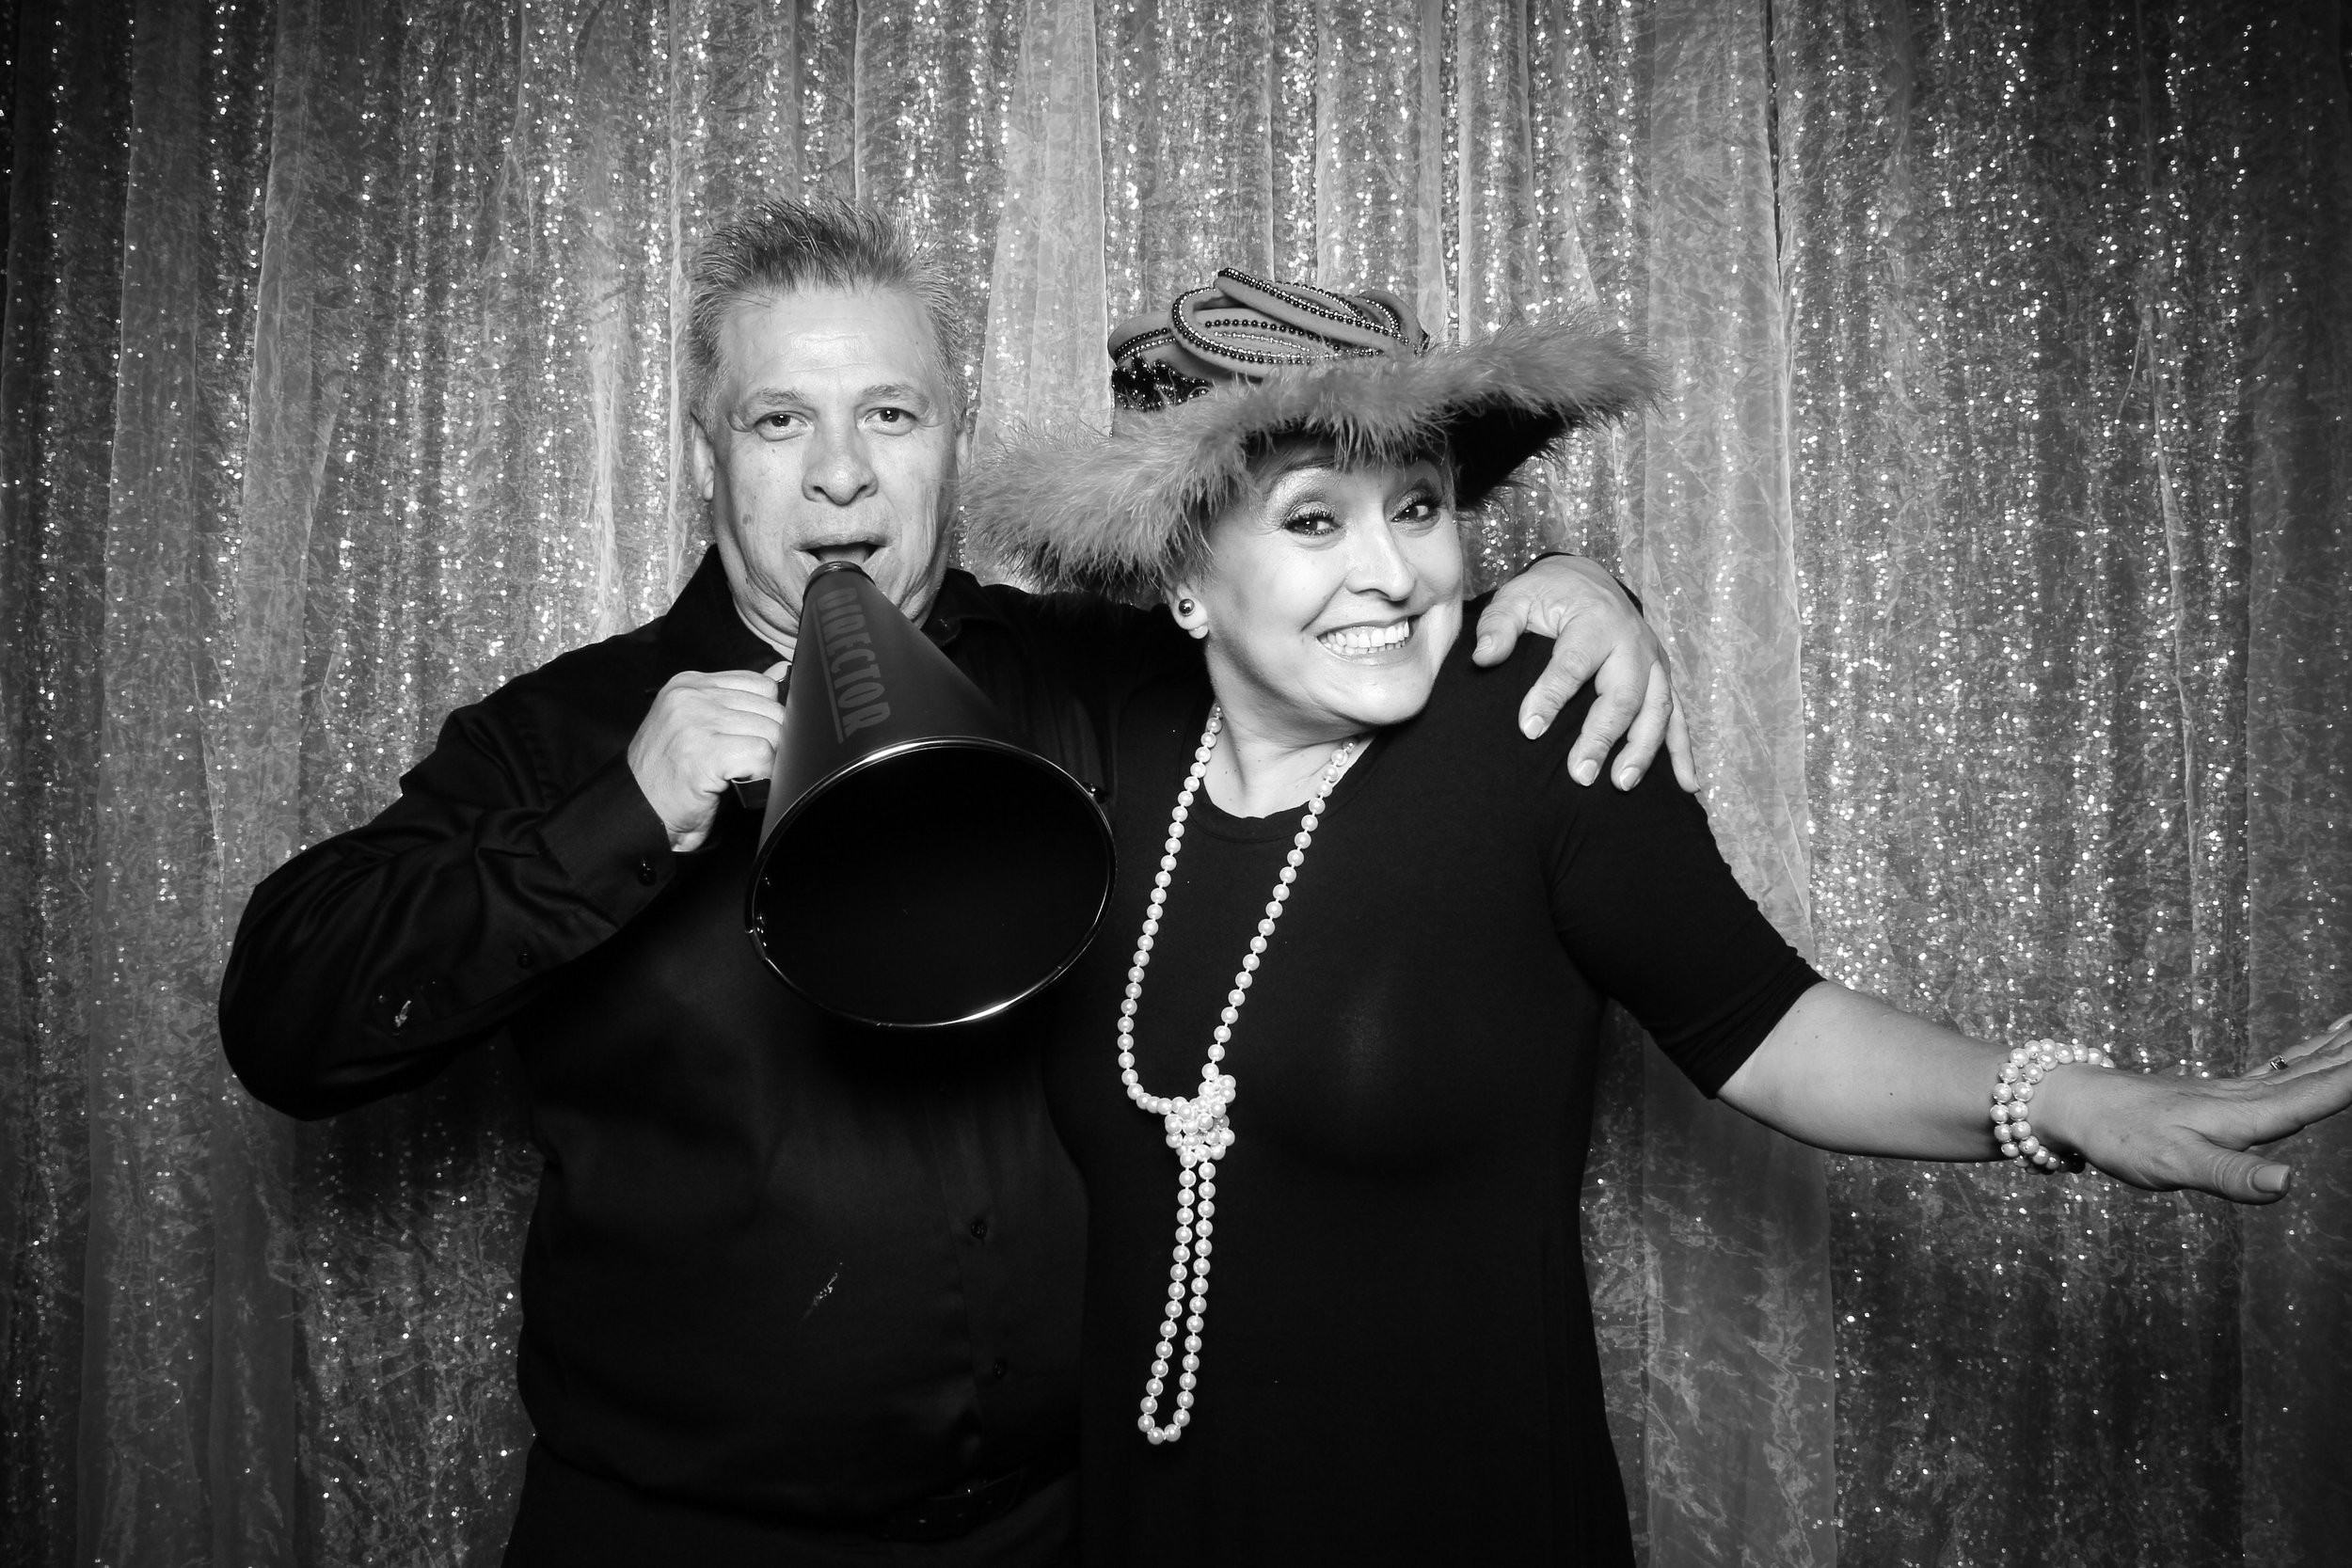 Chicago_Vintage_Wedding_Photobooth_W_Lakeshore_Hotel_20.jpg